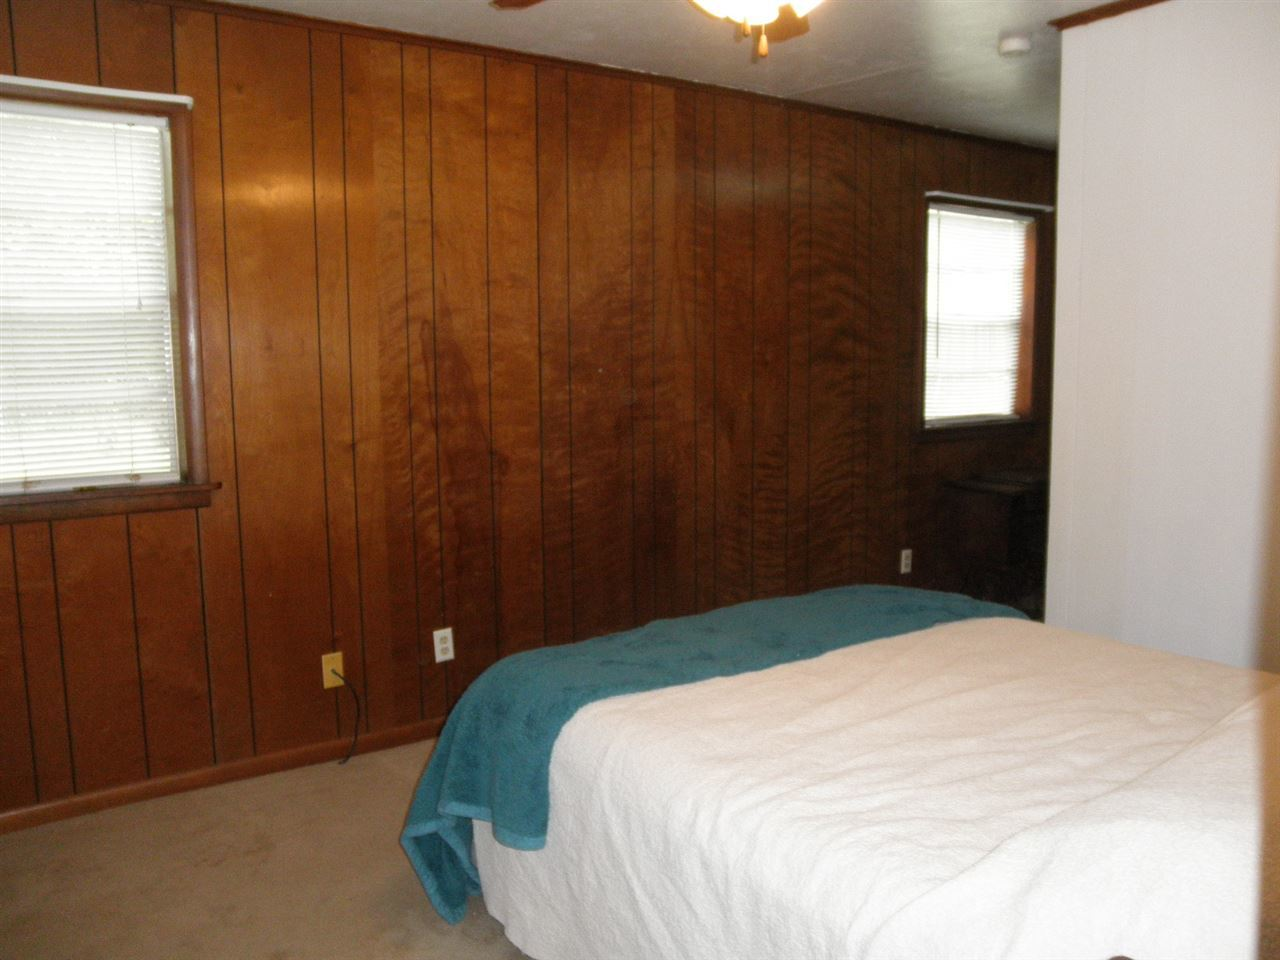 Sold Cross Sale W/ MLS | 808 Gray  Ponca City, OK 74604 19